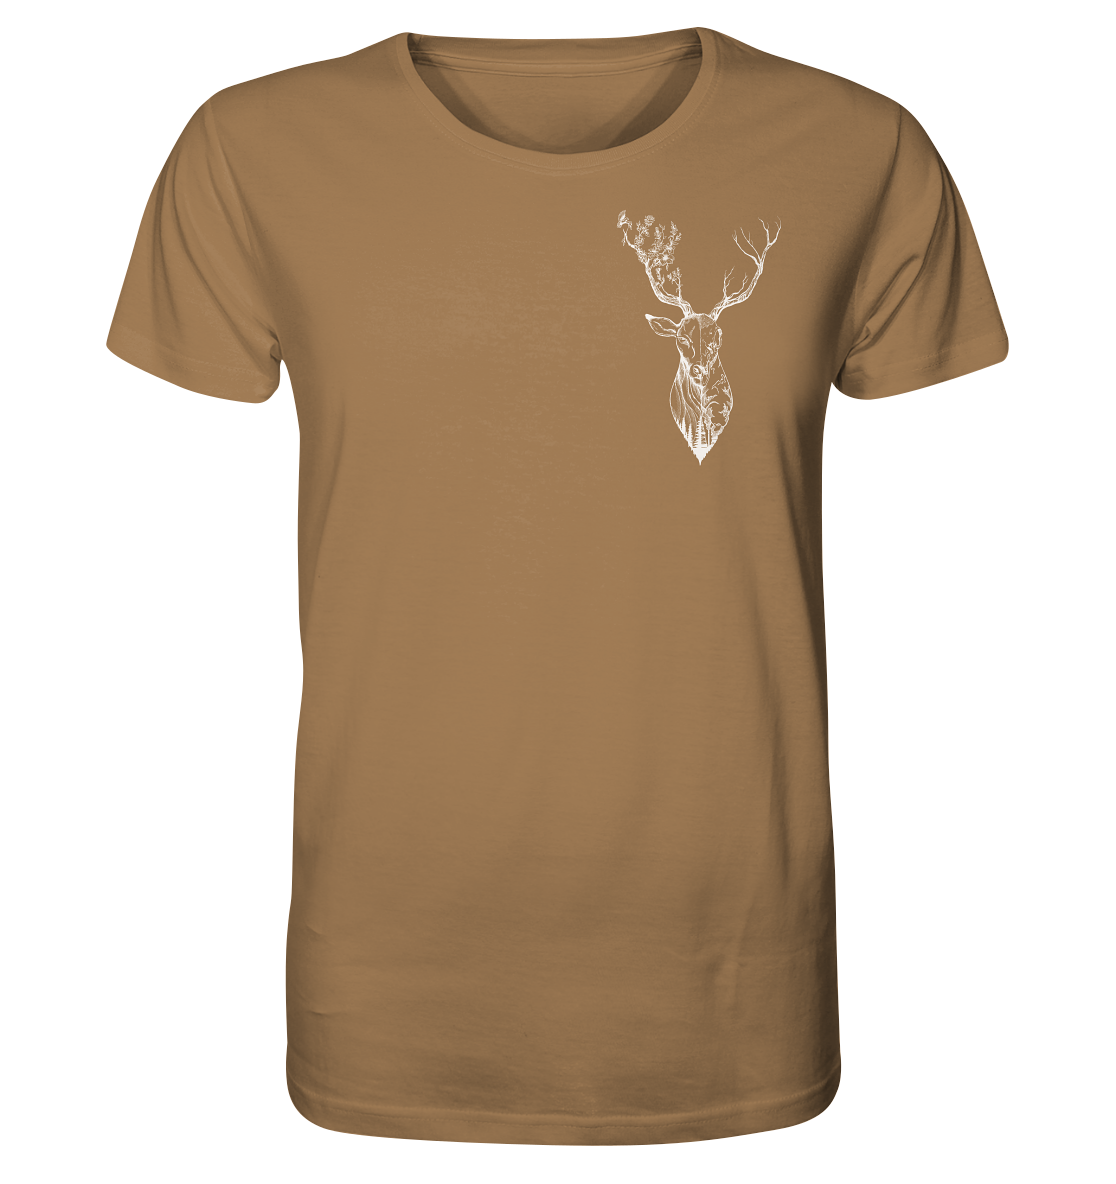 front-organic-shirt-a17c55-1116x-12.png